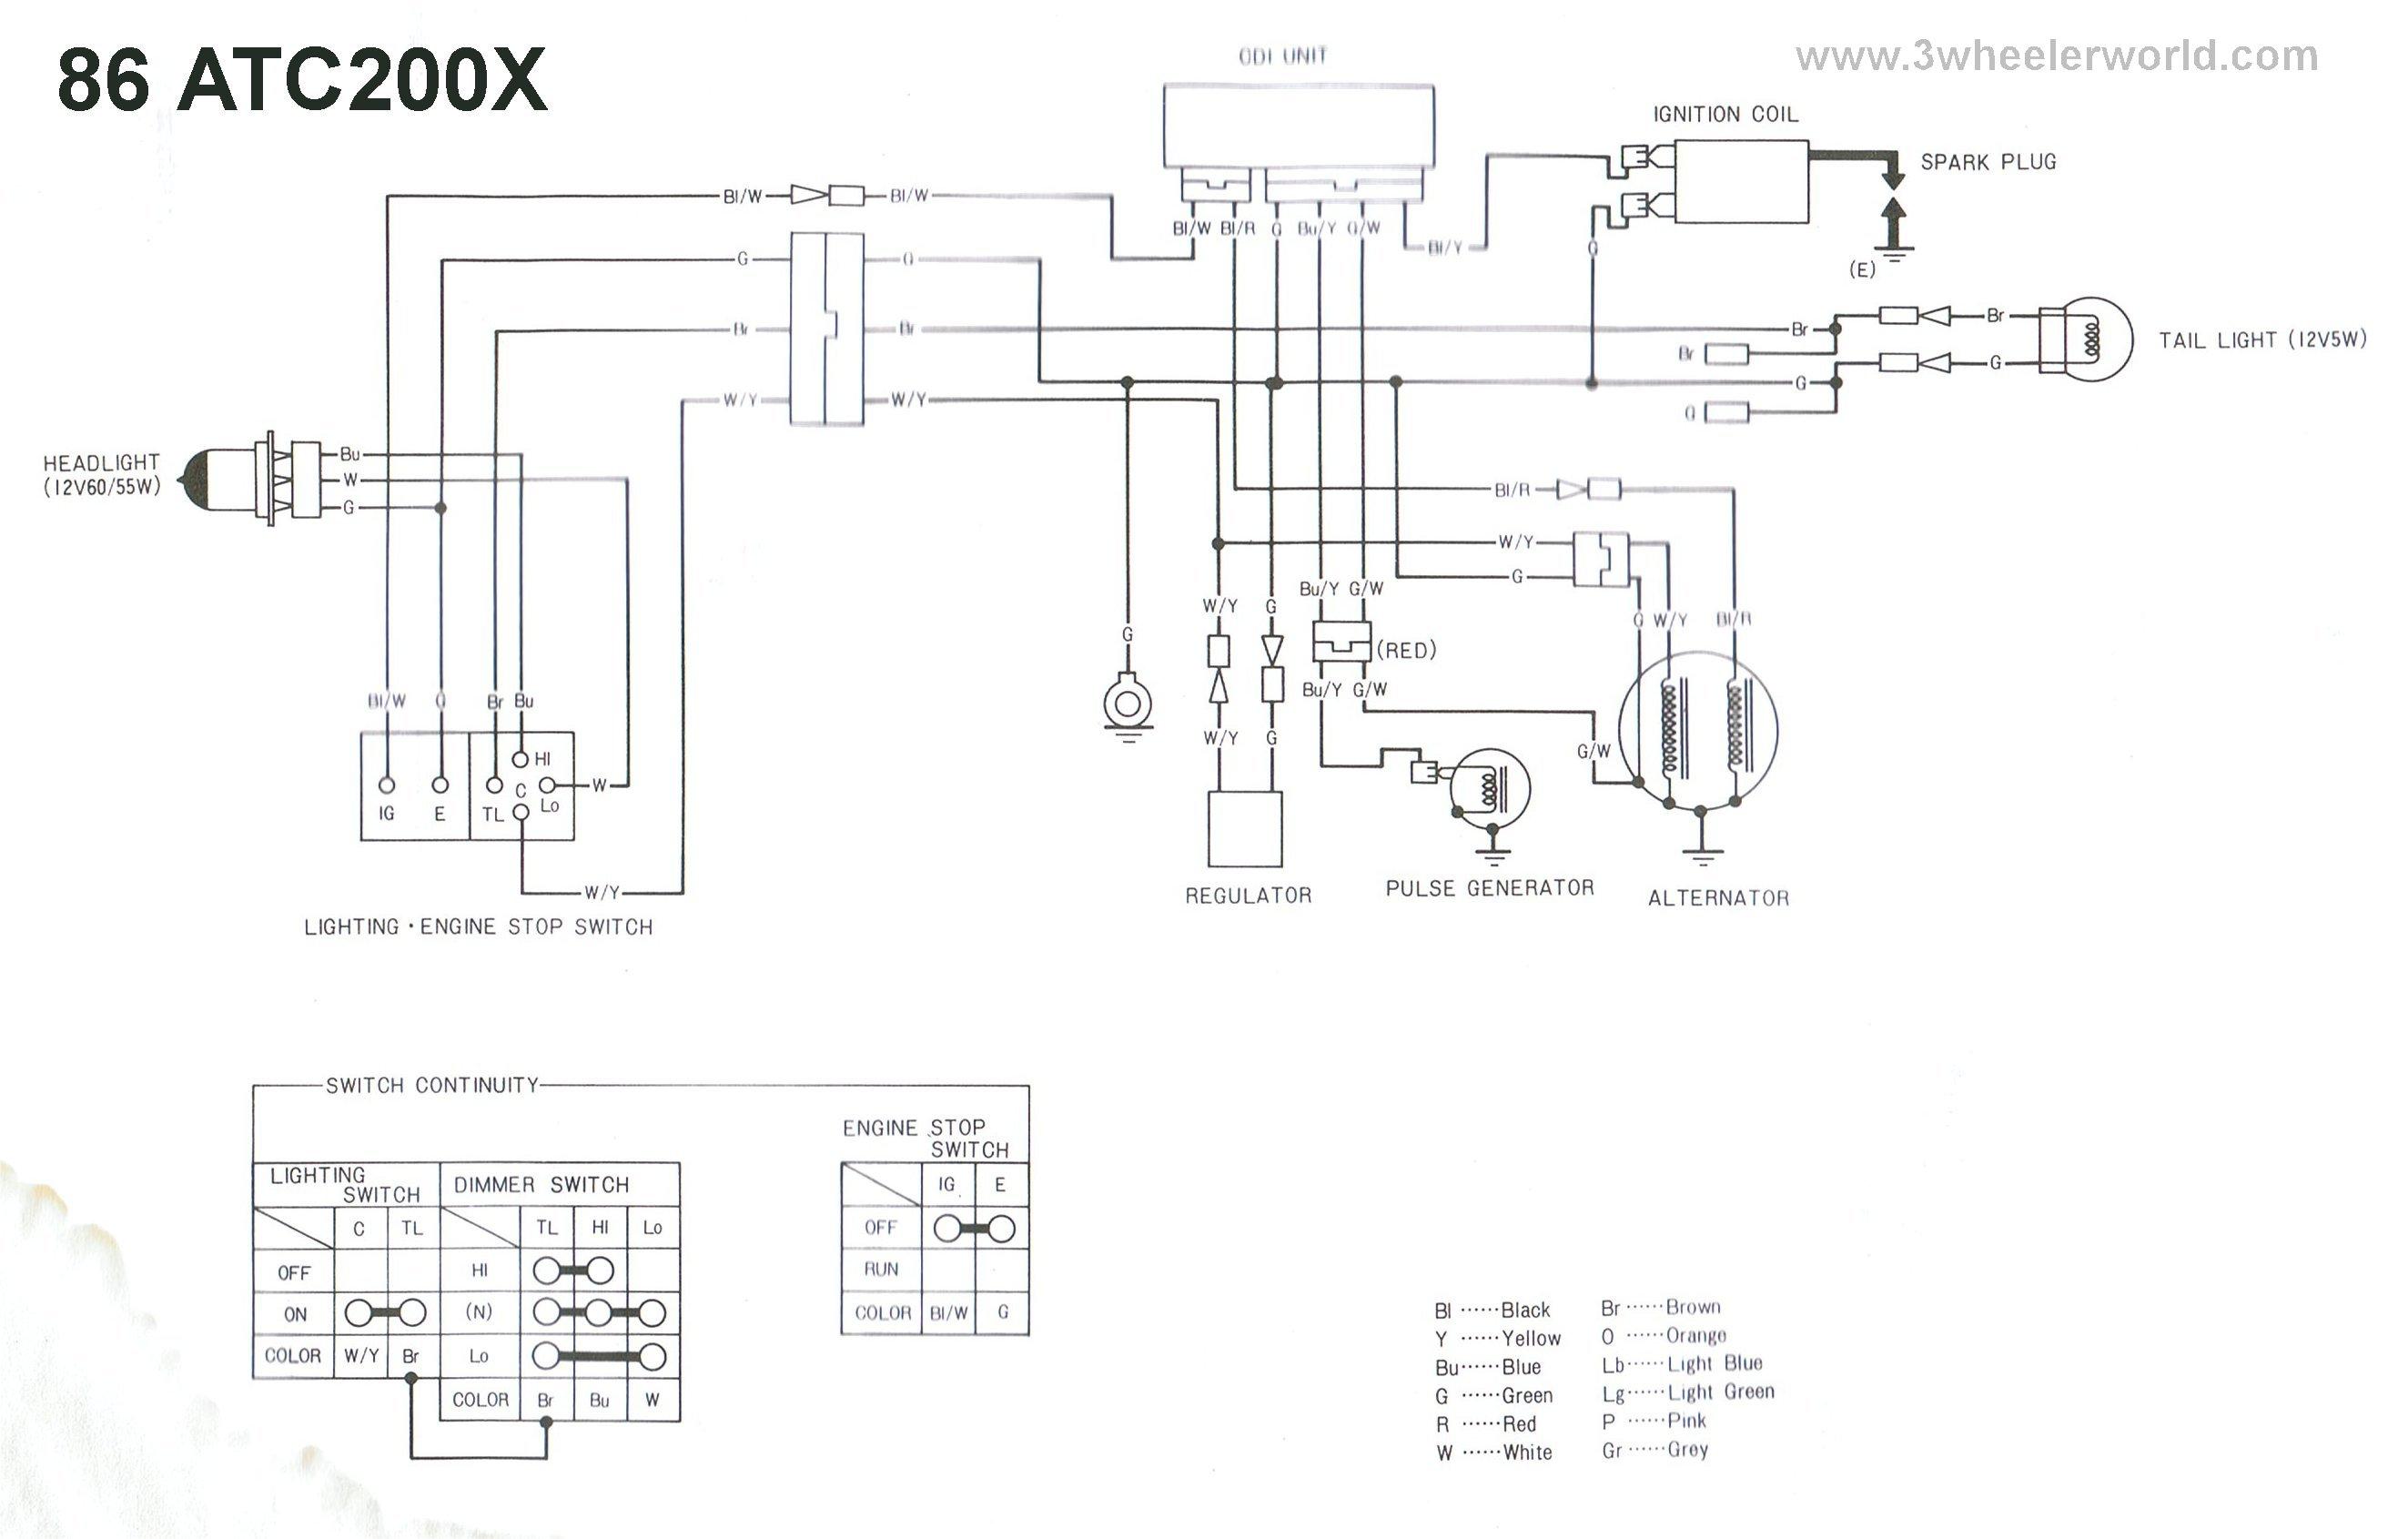 Honda 40x Wiring Diagram   skip www Wiring Diagram ID   skip www ...